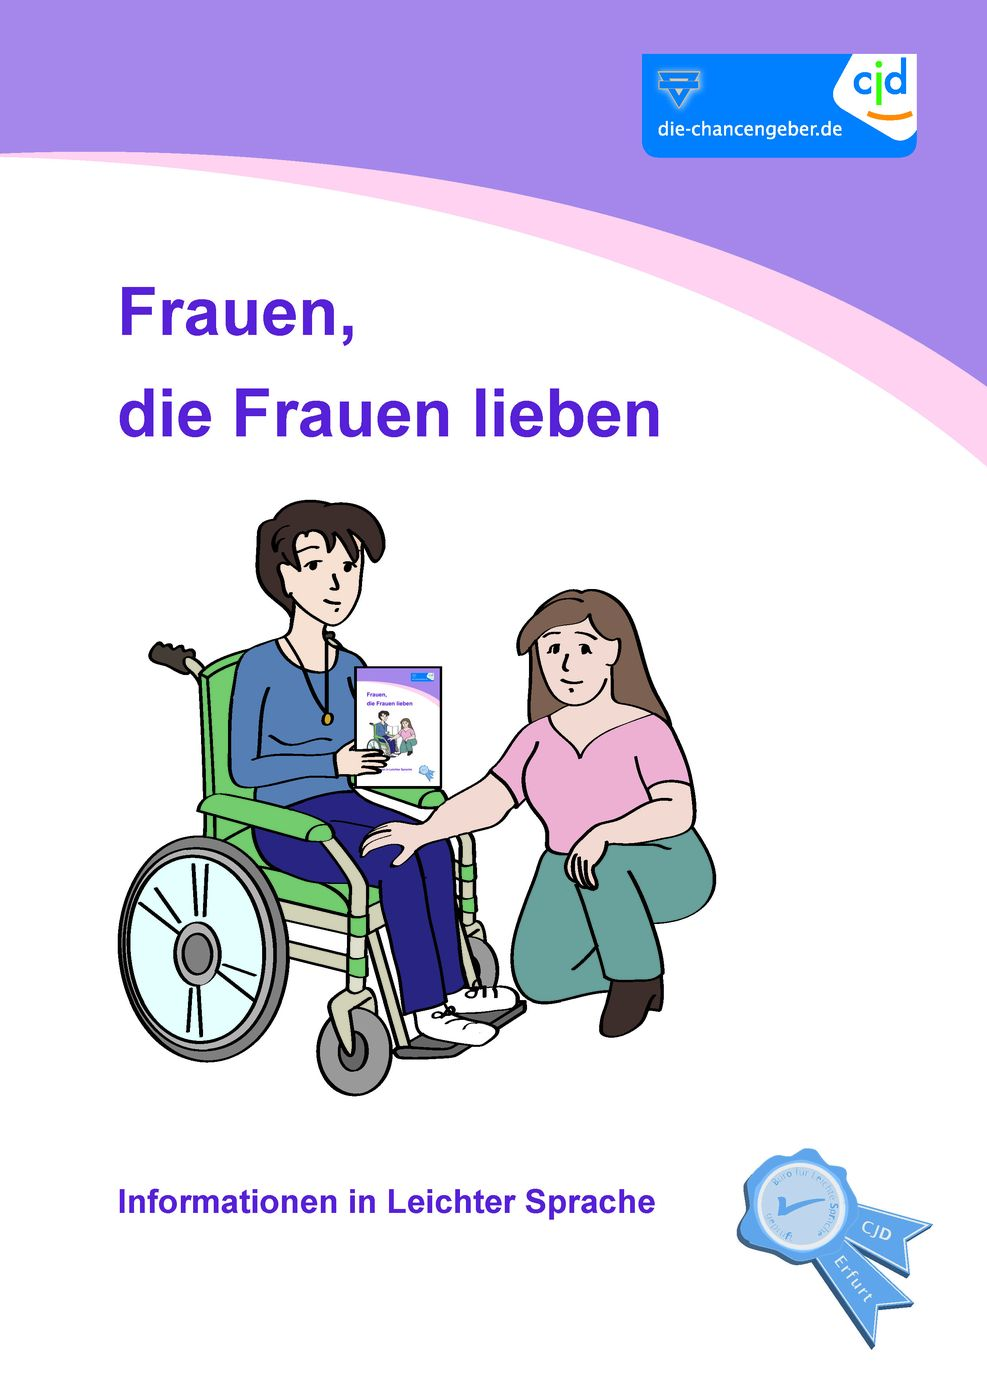 Frauen ab 55 kennenlernen Splitter Verlag - Comics und Graphic Novels - Söldner Bd. 5: Shalin (erster Teil)